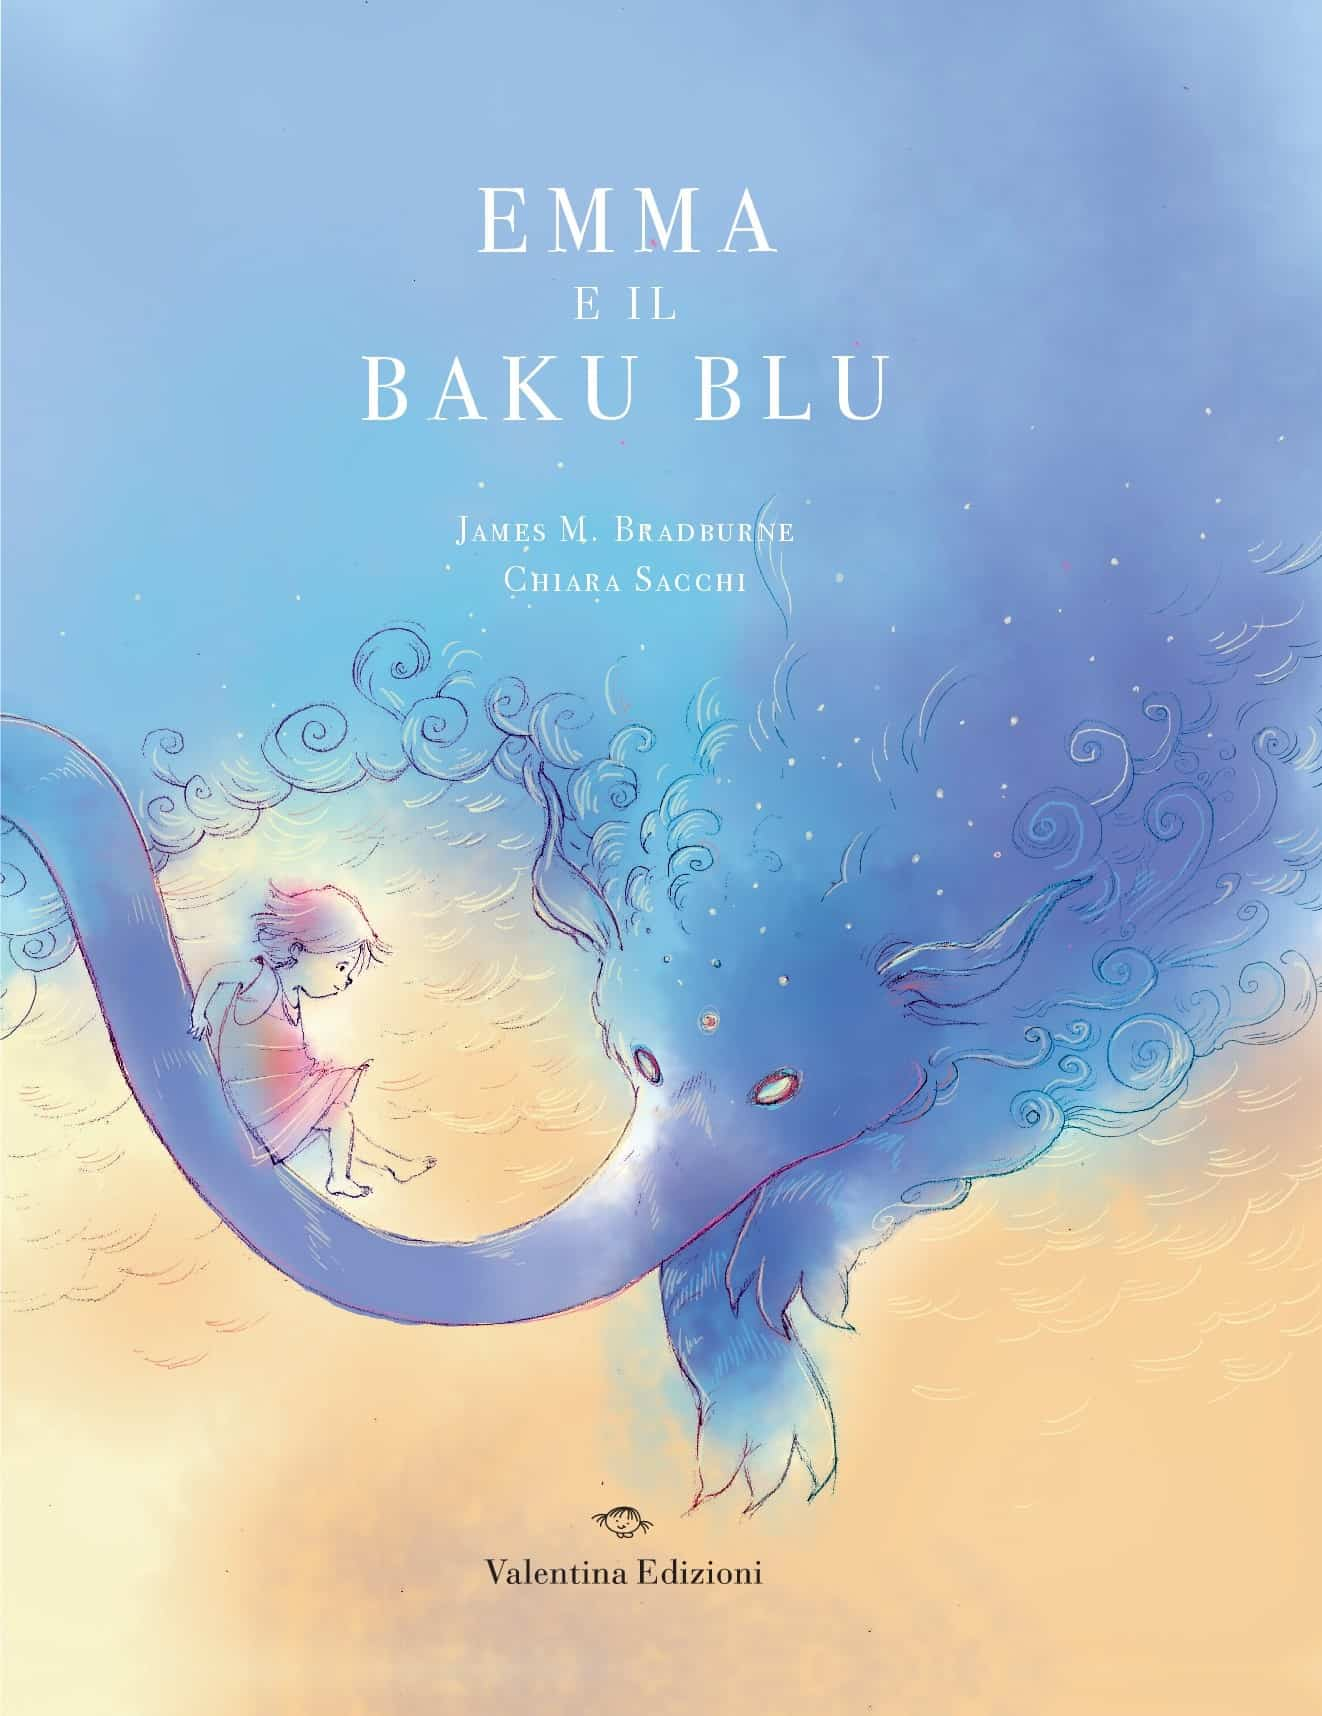 James M. Bradburne - Chiara Sacchi, Emma e il Baku blu, Valentina